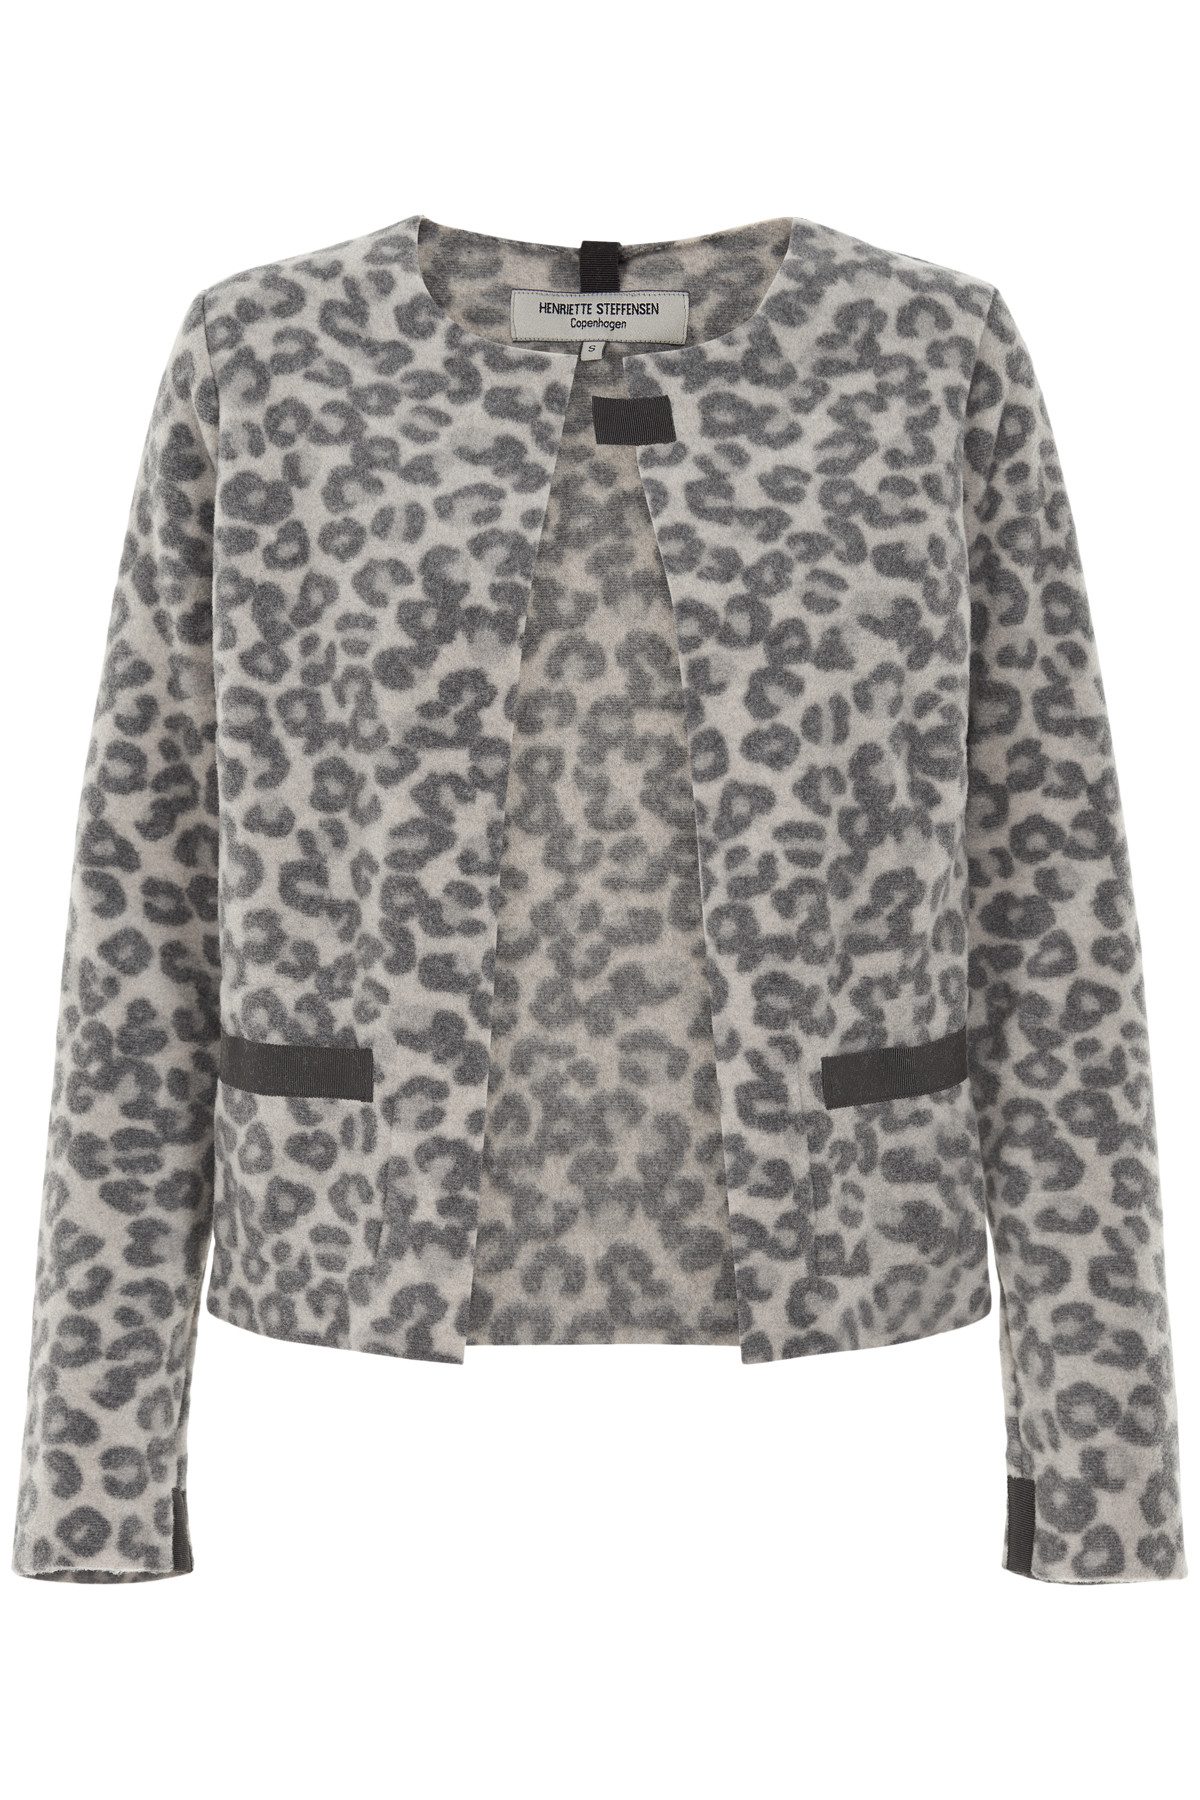 Image of   HENRIETTE STEFFENSEN Copenhagen 7109 CARDIGAN LEOPARD (Leopard, L)